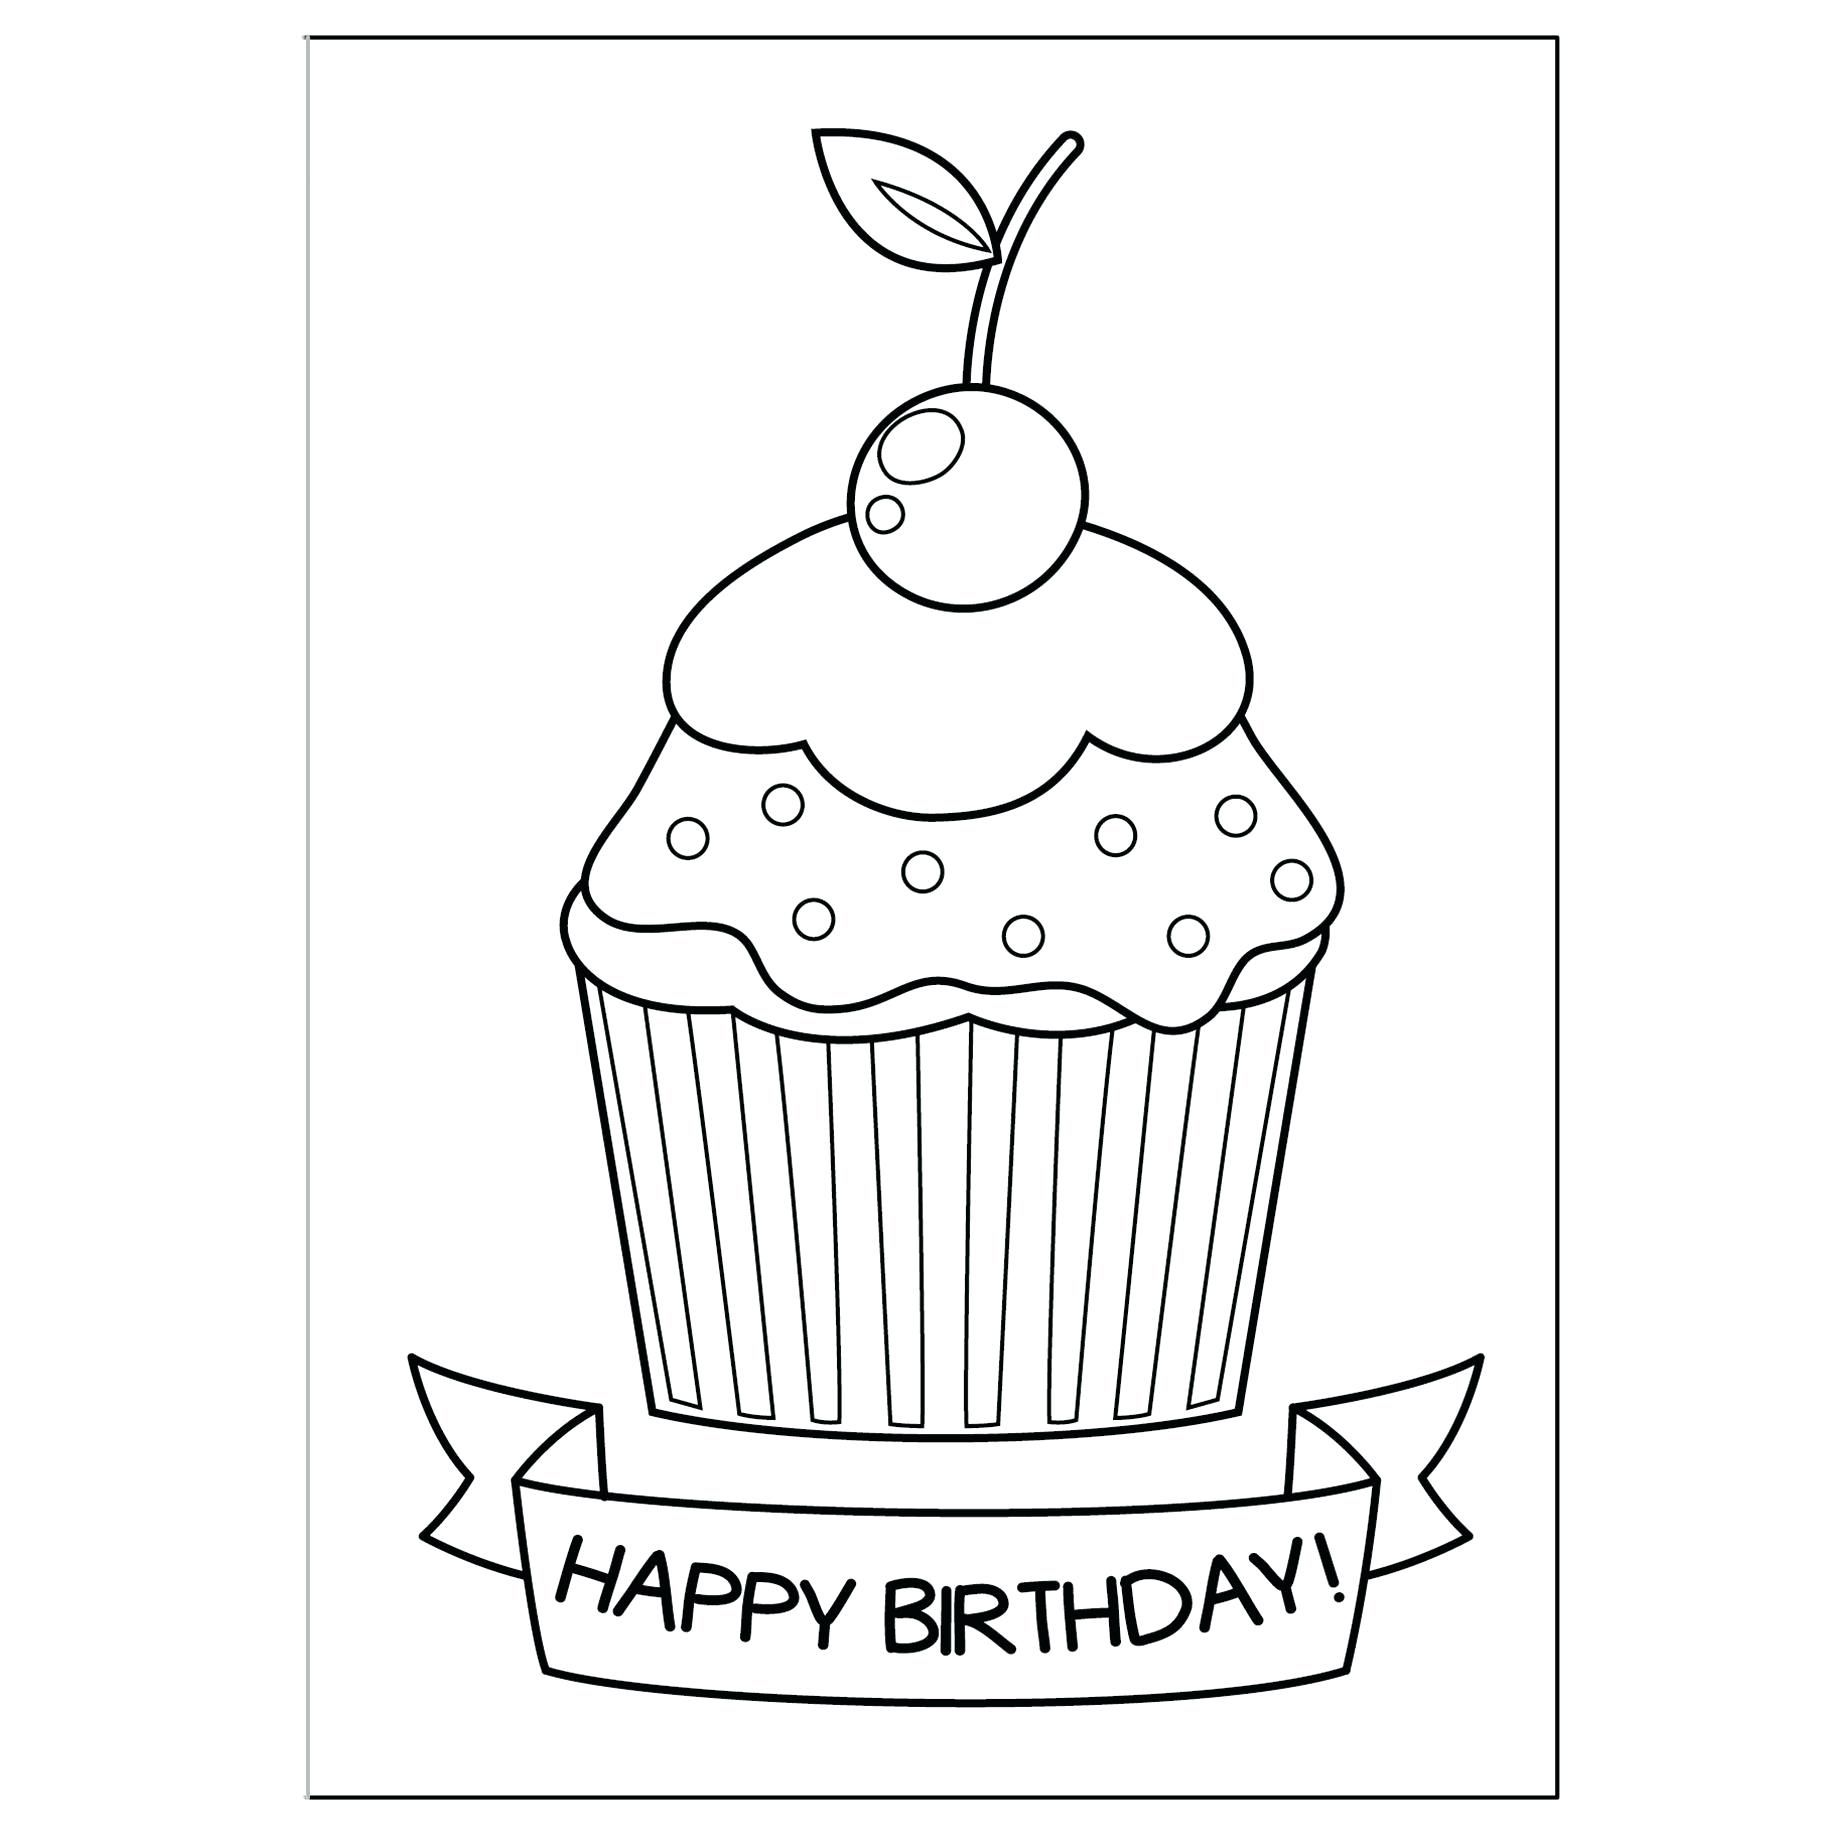 Coloring Printable Coloring Birthday Card For Mom Funny Intended For Mom Birthday Car Geburtstag Malvorlagen Geburtstagskarten Drucken Mama Geburtstagskarten